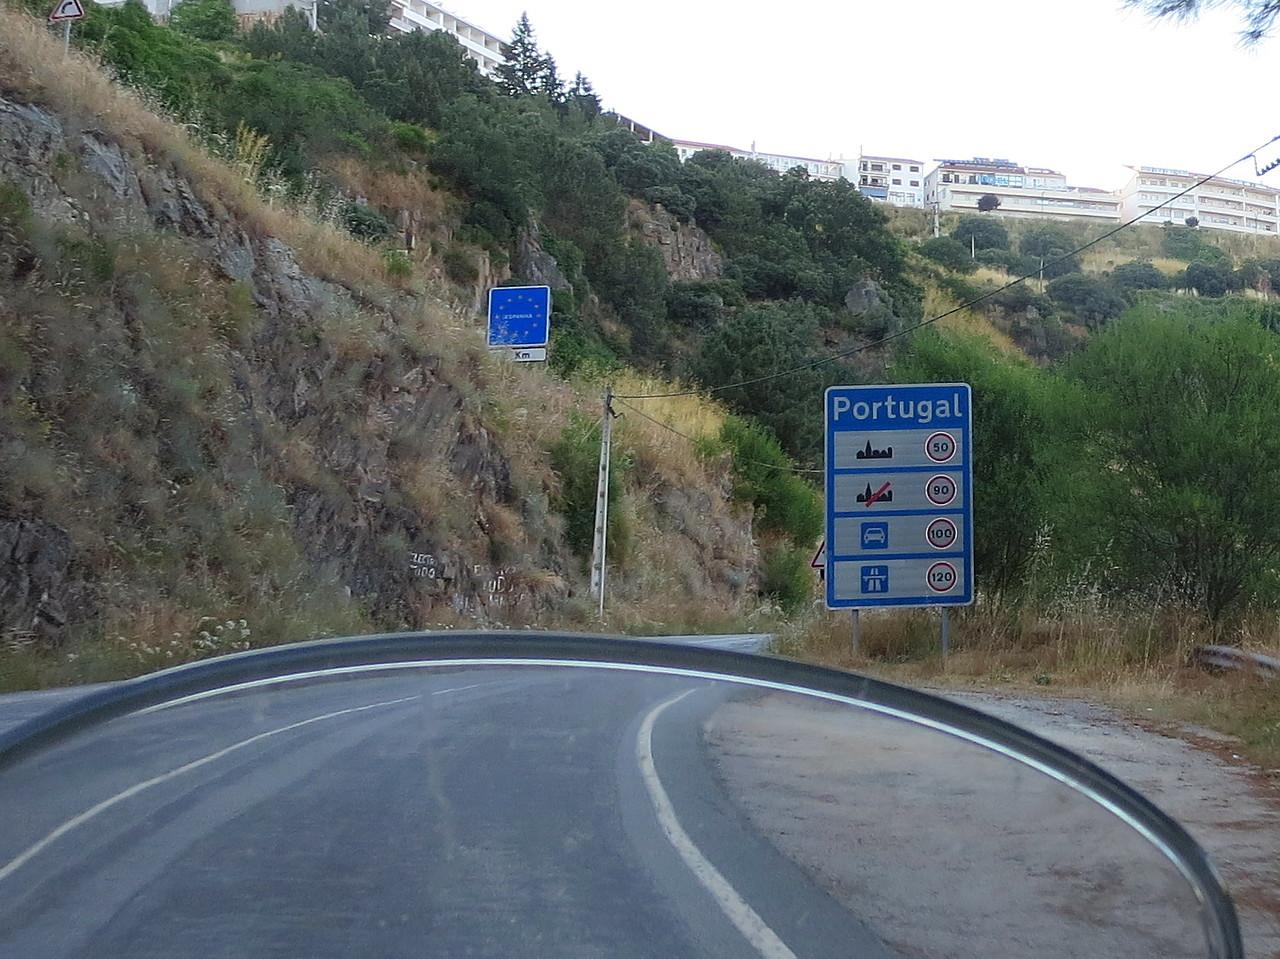 Dois noites em Miranda do Douro 2D5804D9DE325777A6052C57779570